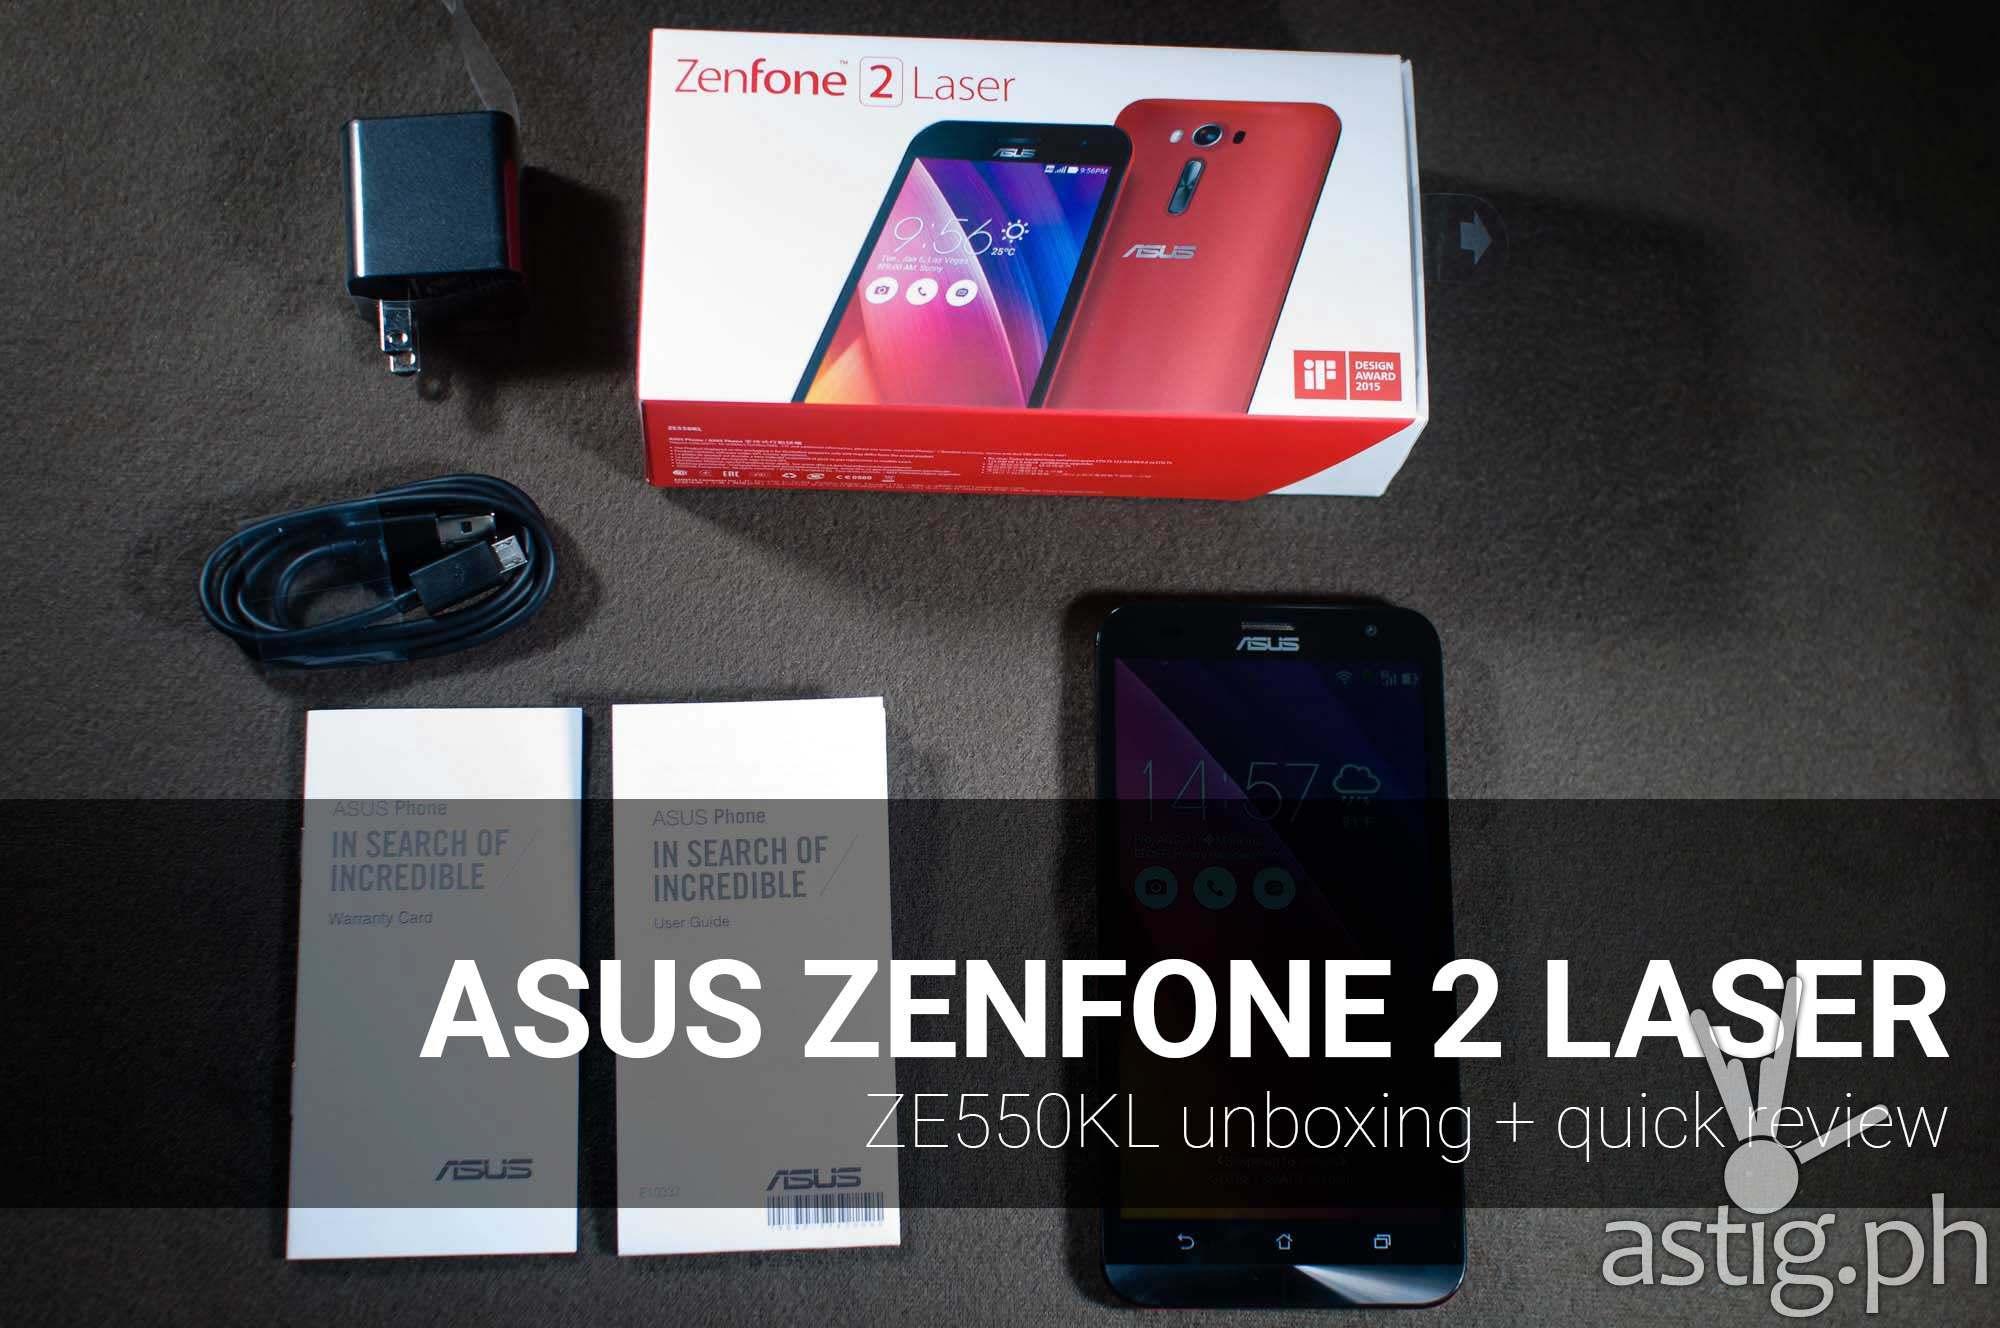 ASUS Zenfone 2 Laser unboxing review video